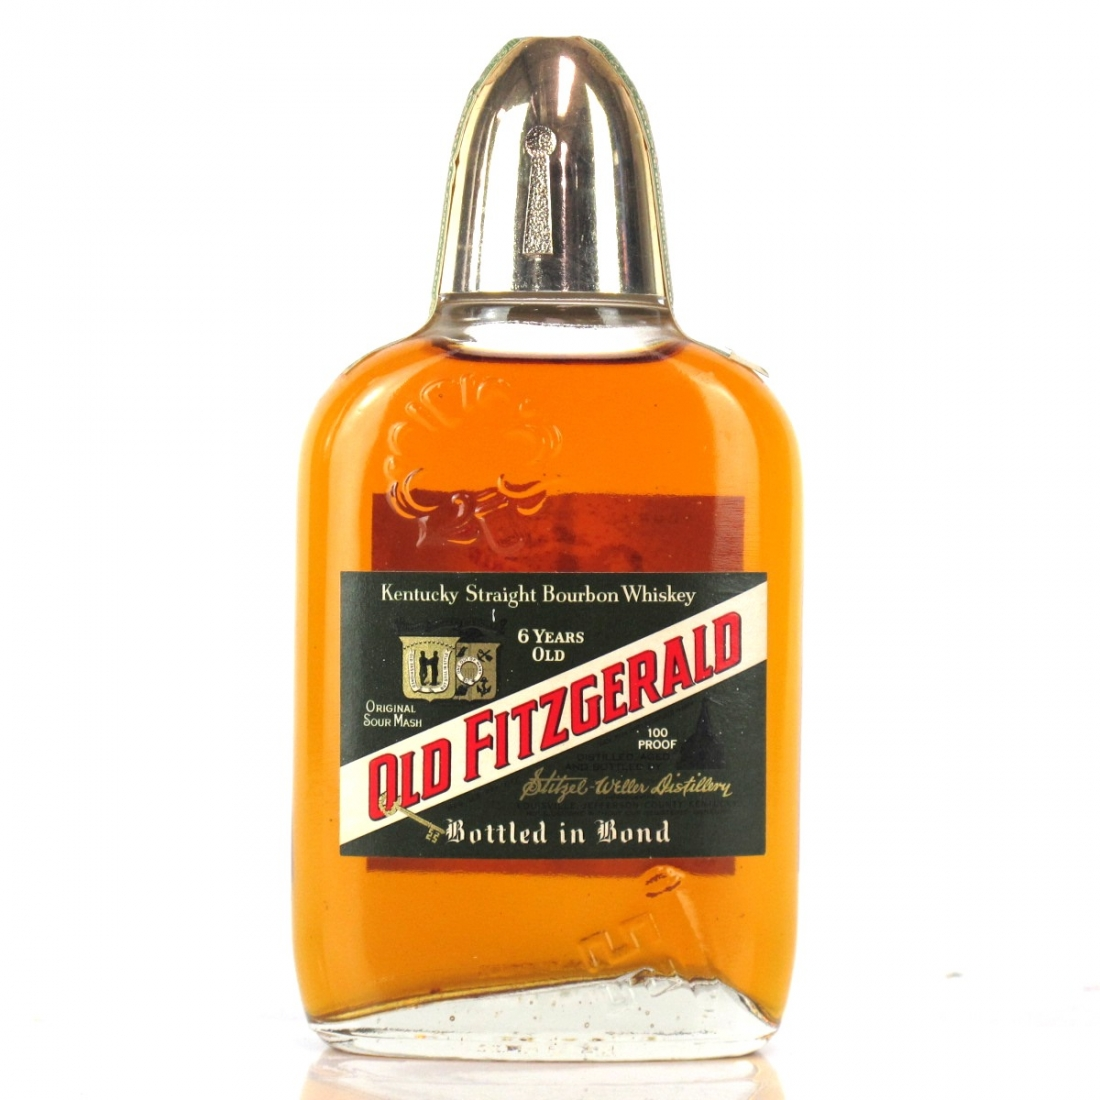 Old Fitzgerald 1967 Bonded 6 Year Old Half Pint / Stitzel-Weller